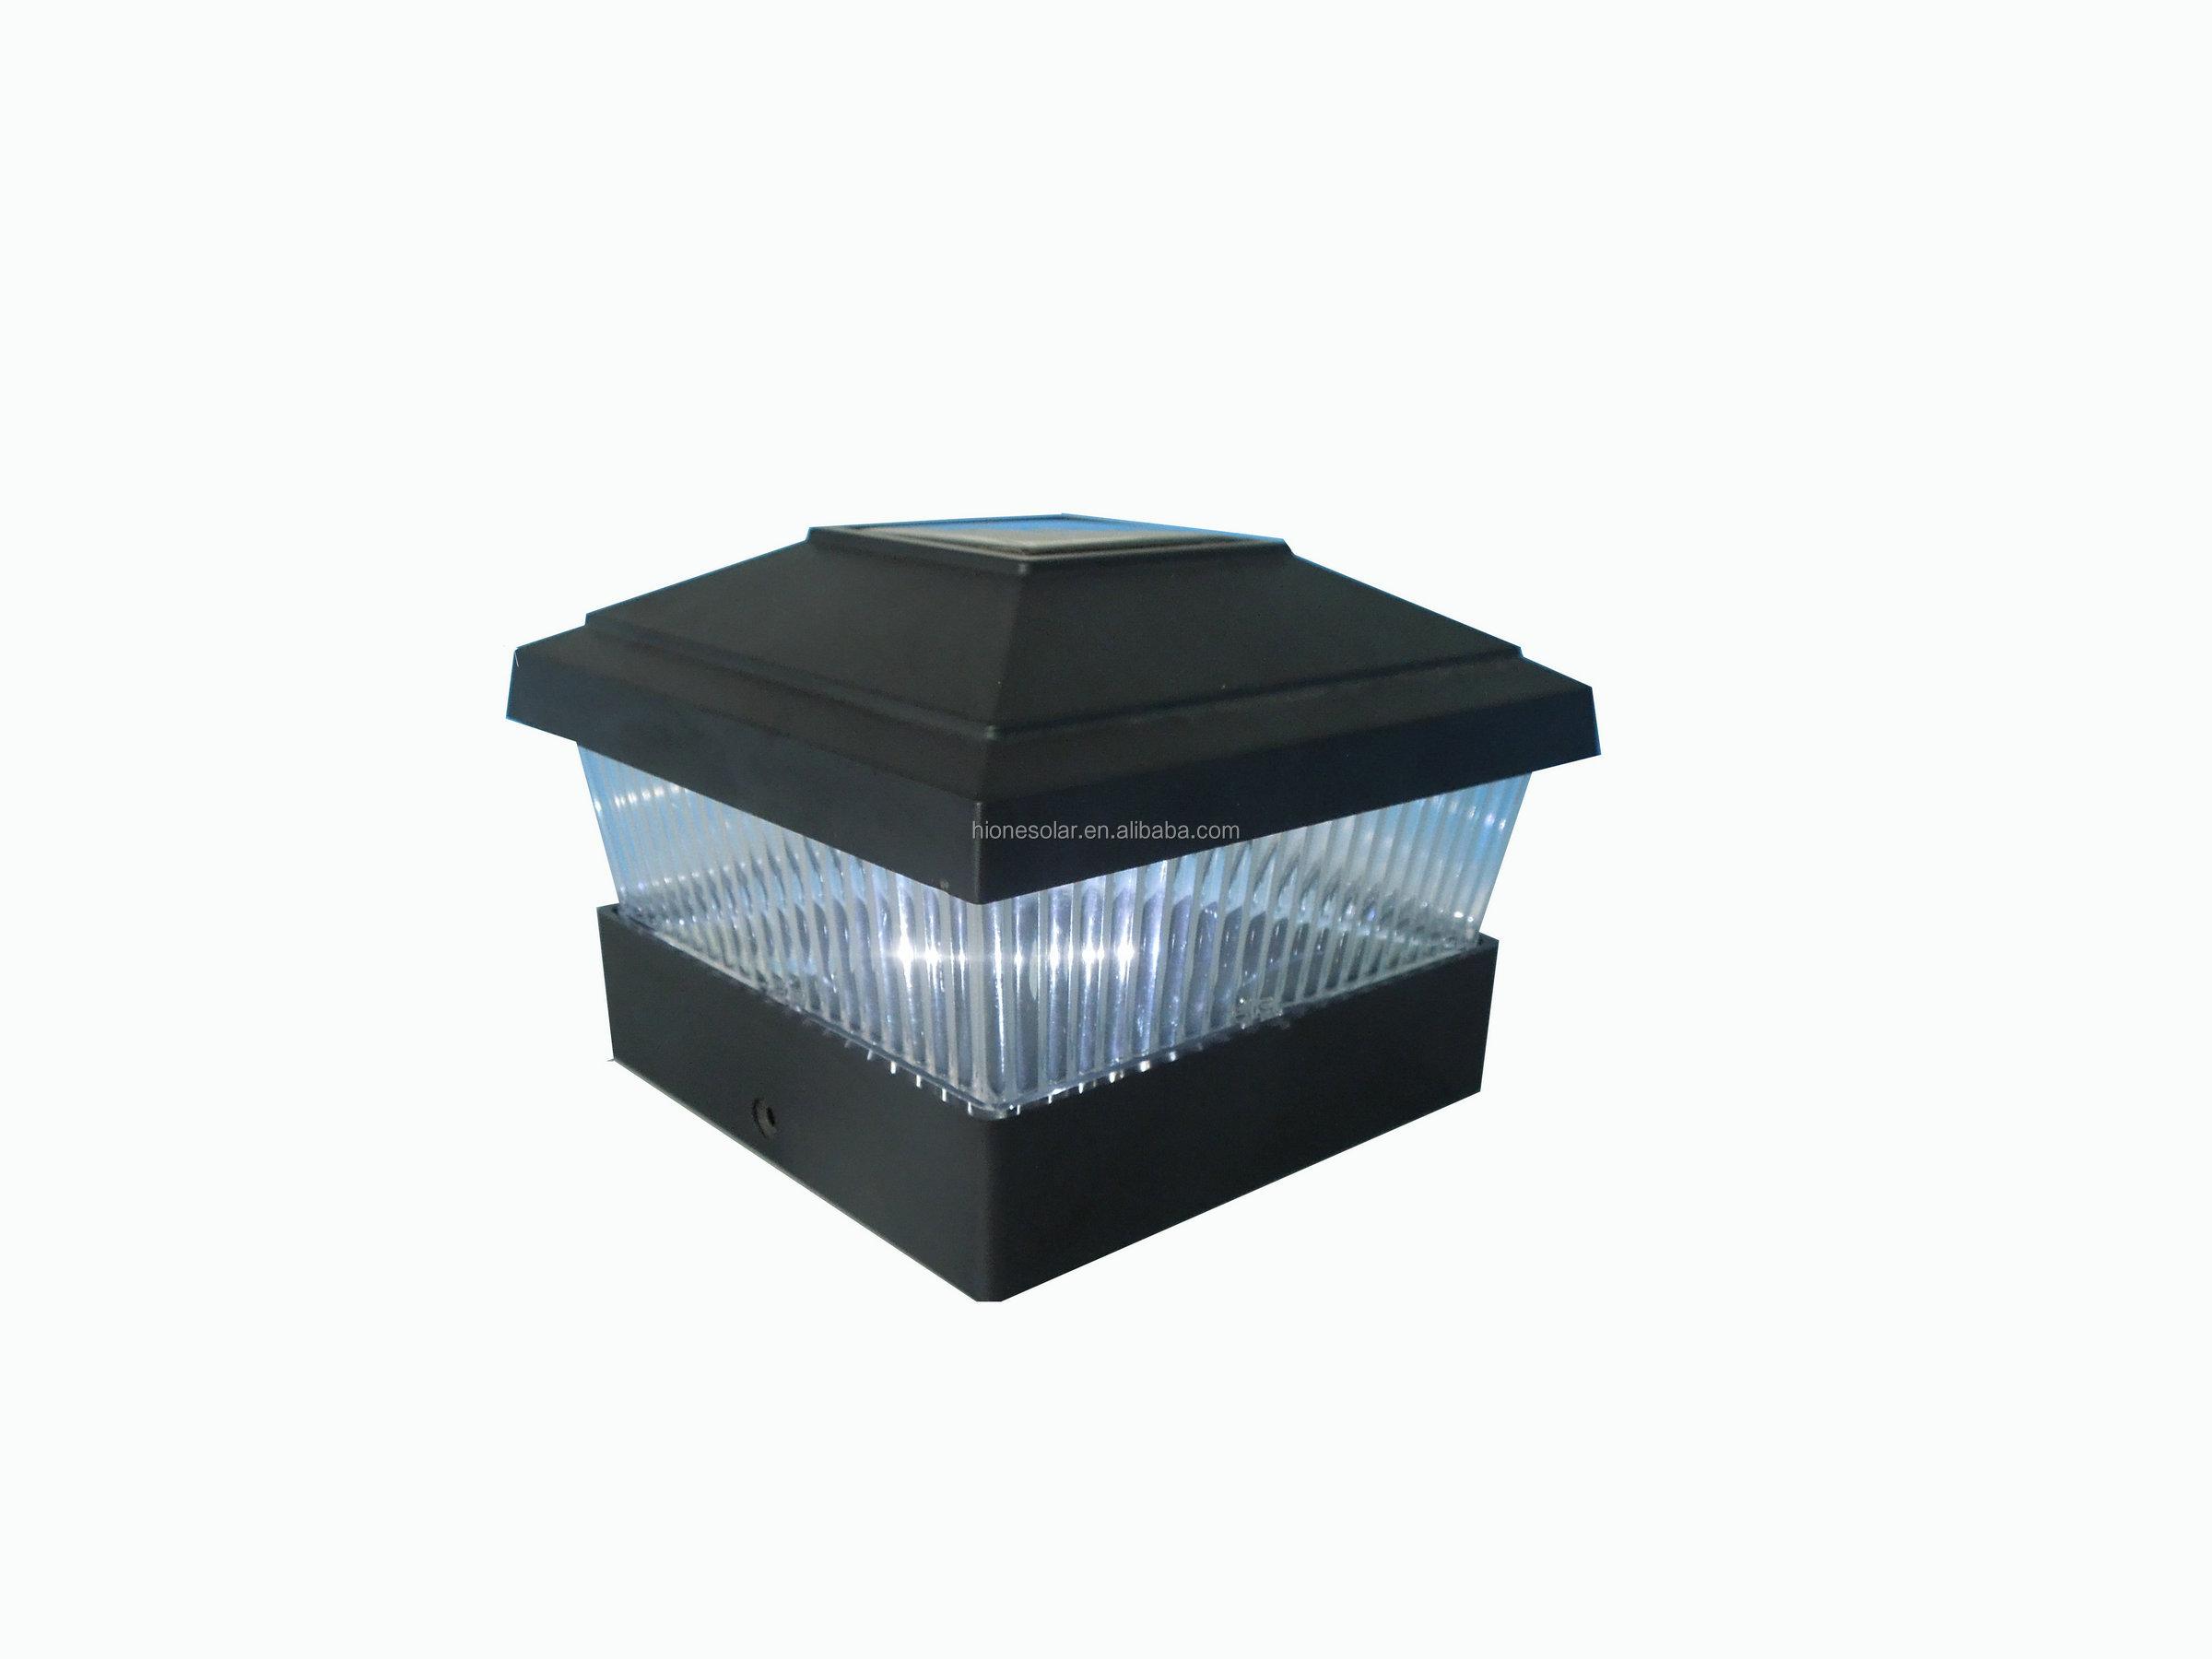 Kingfisher Solarbetrieben Mit Led Beleuchtung Ladekabel